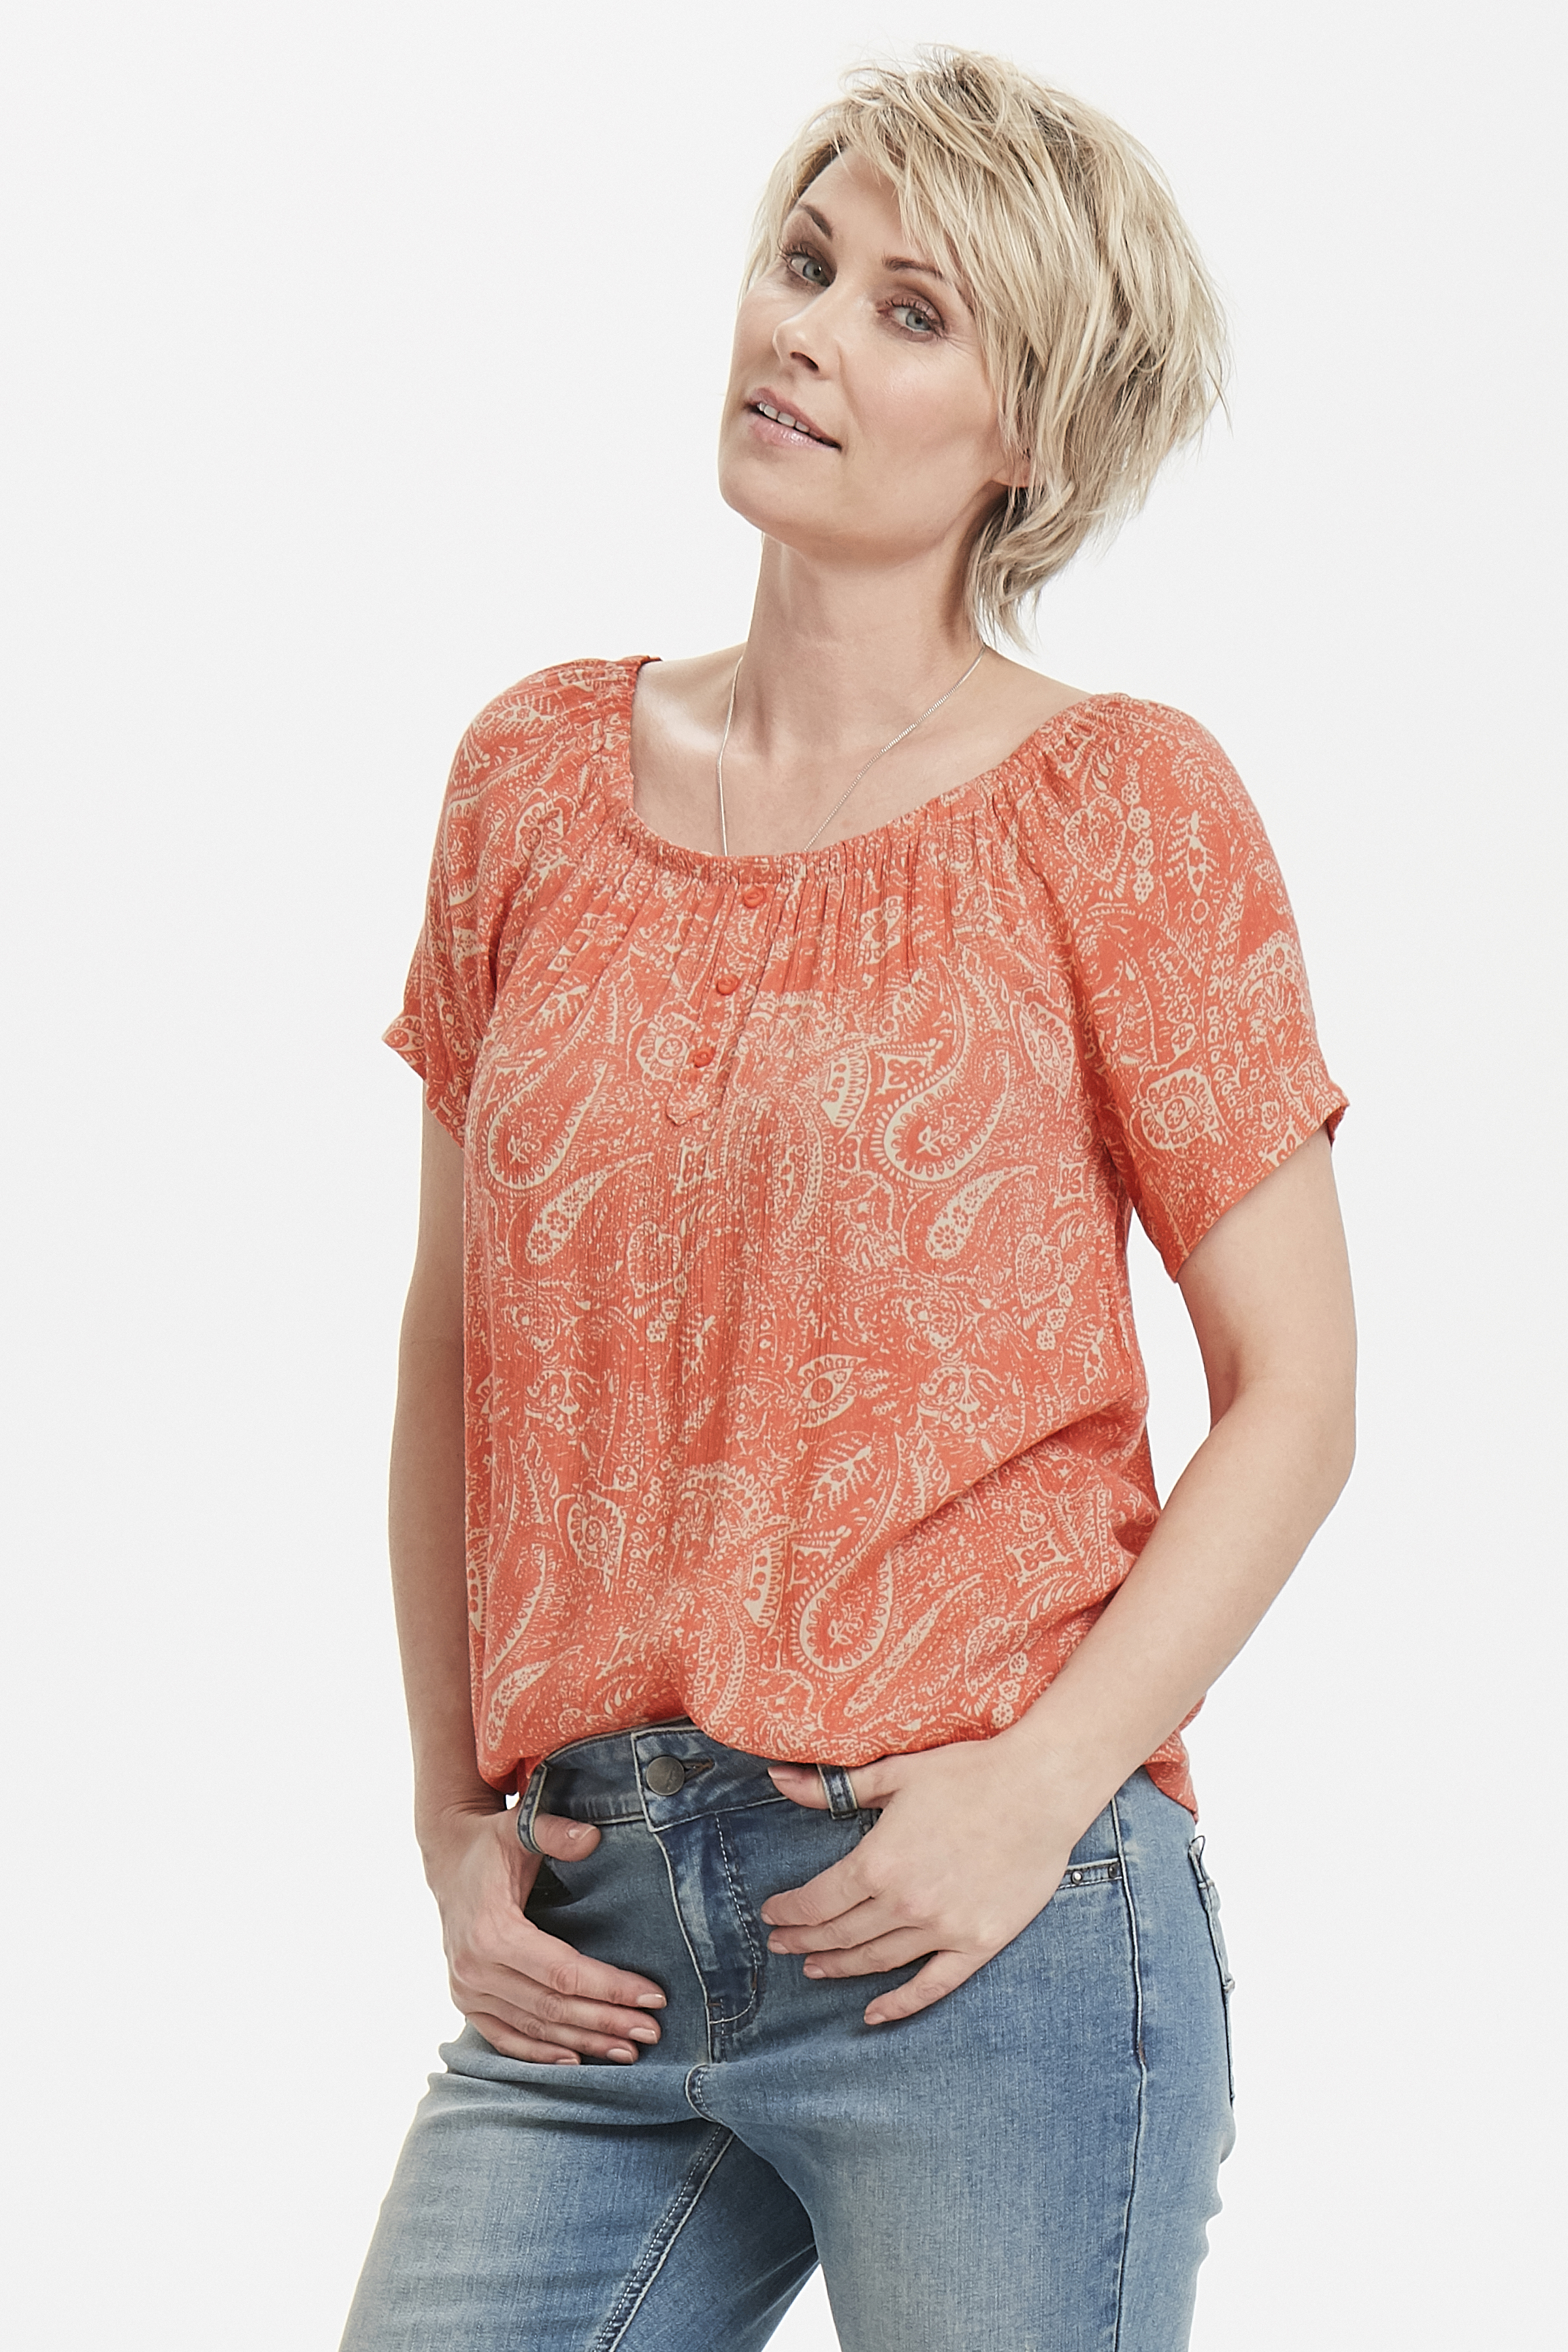 Koralle/creme Bluse von Bon'A Parte – Shoppen Sie Koralle/creme Bluse ab Gr. S-2XL hier